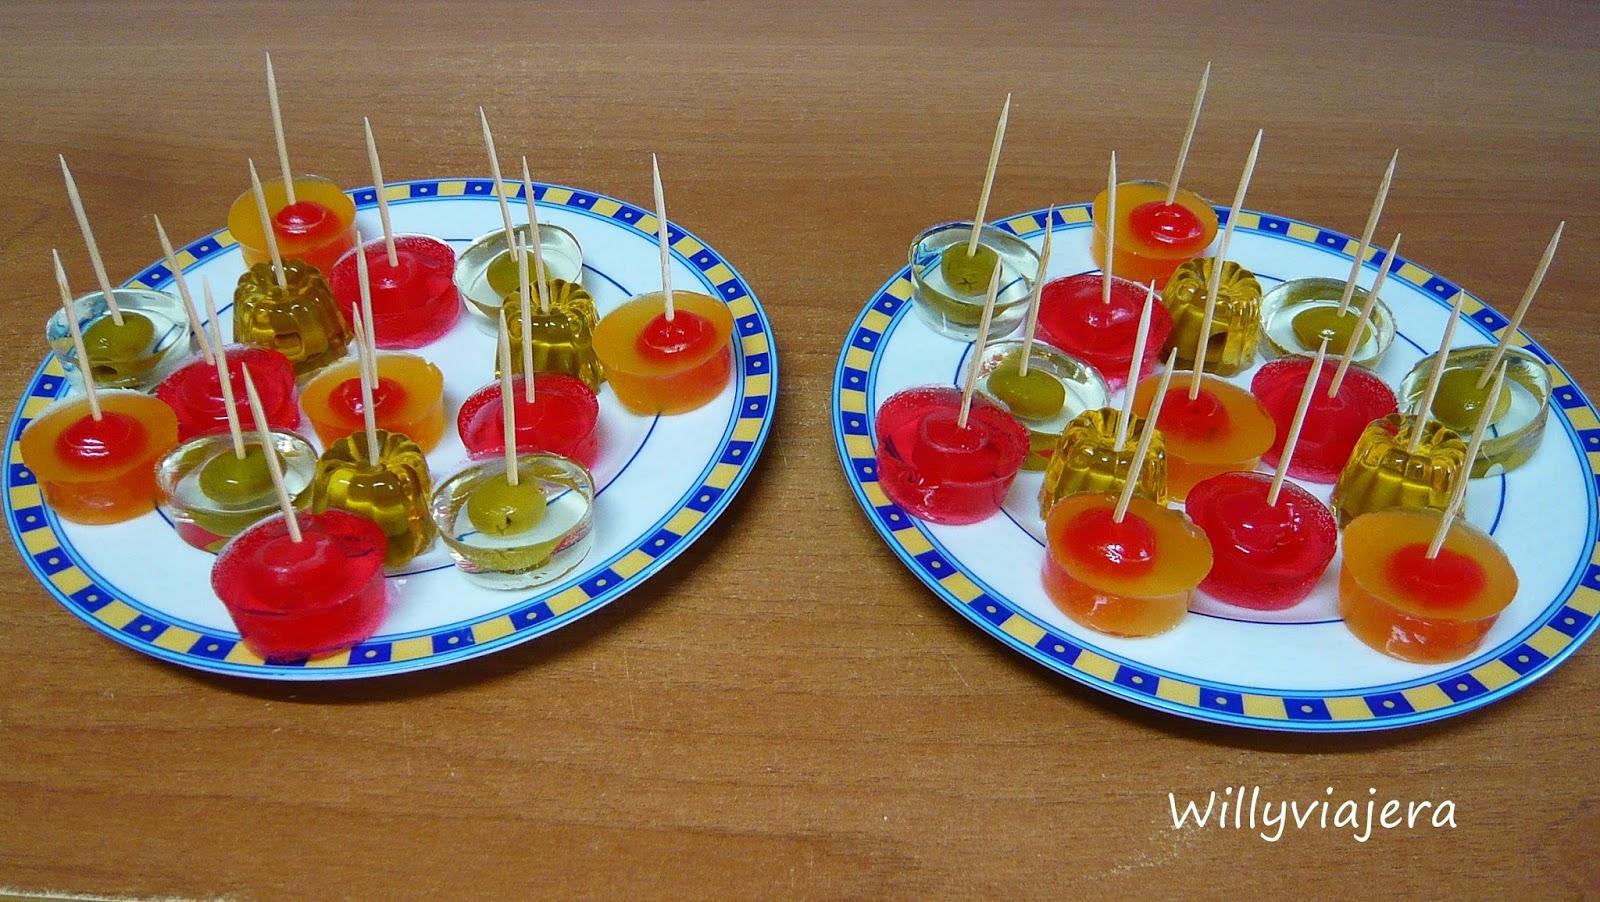 Willyviajera puri comida navidad 2016 - Comida para navidad facil ...